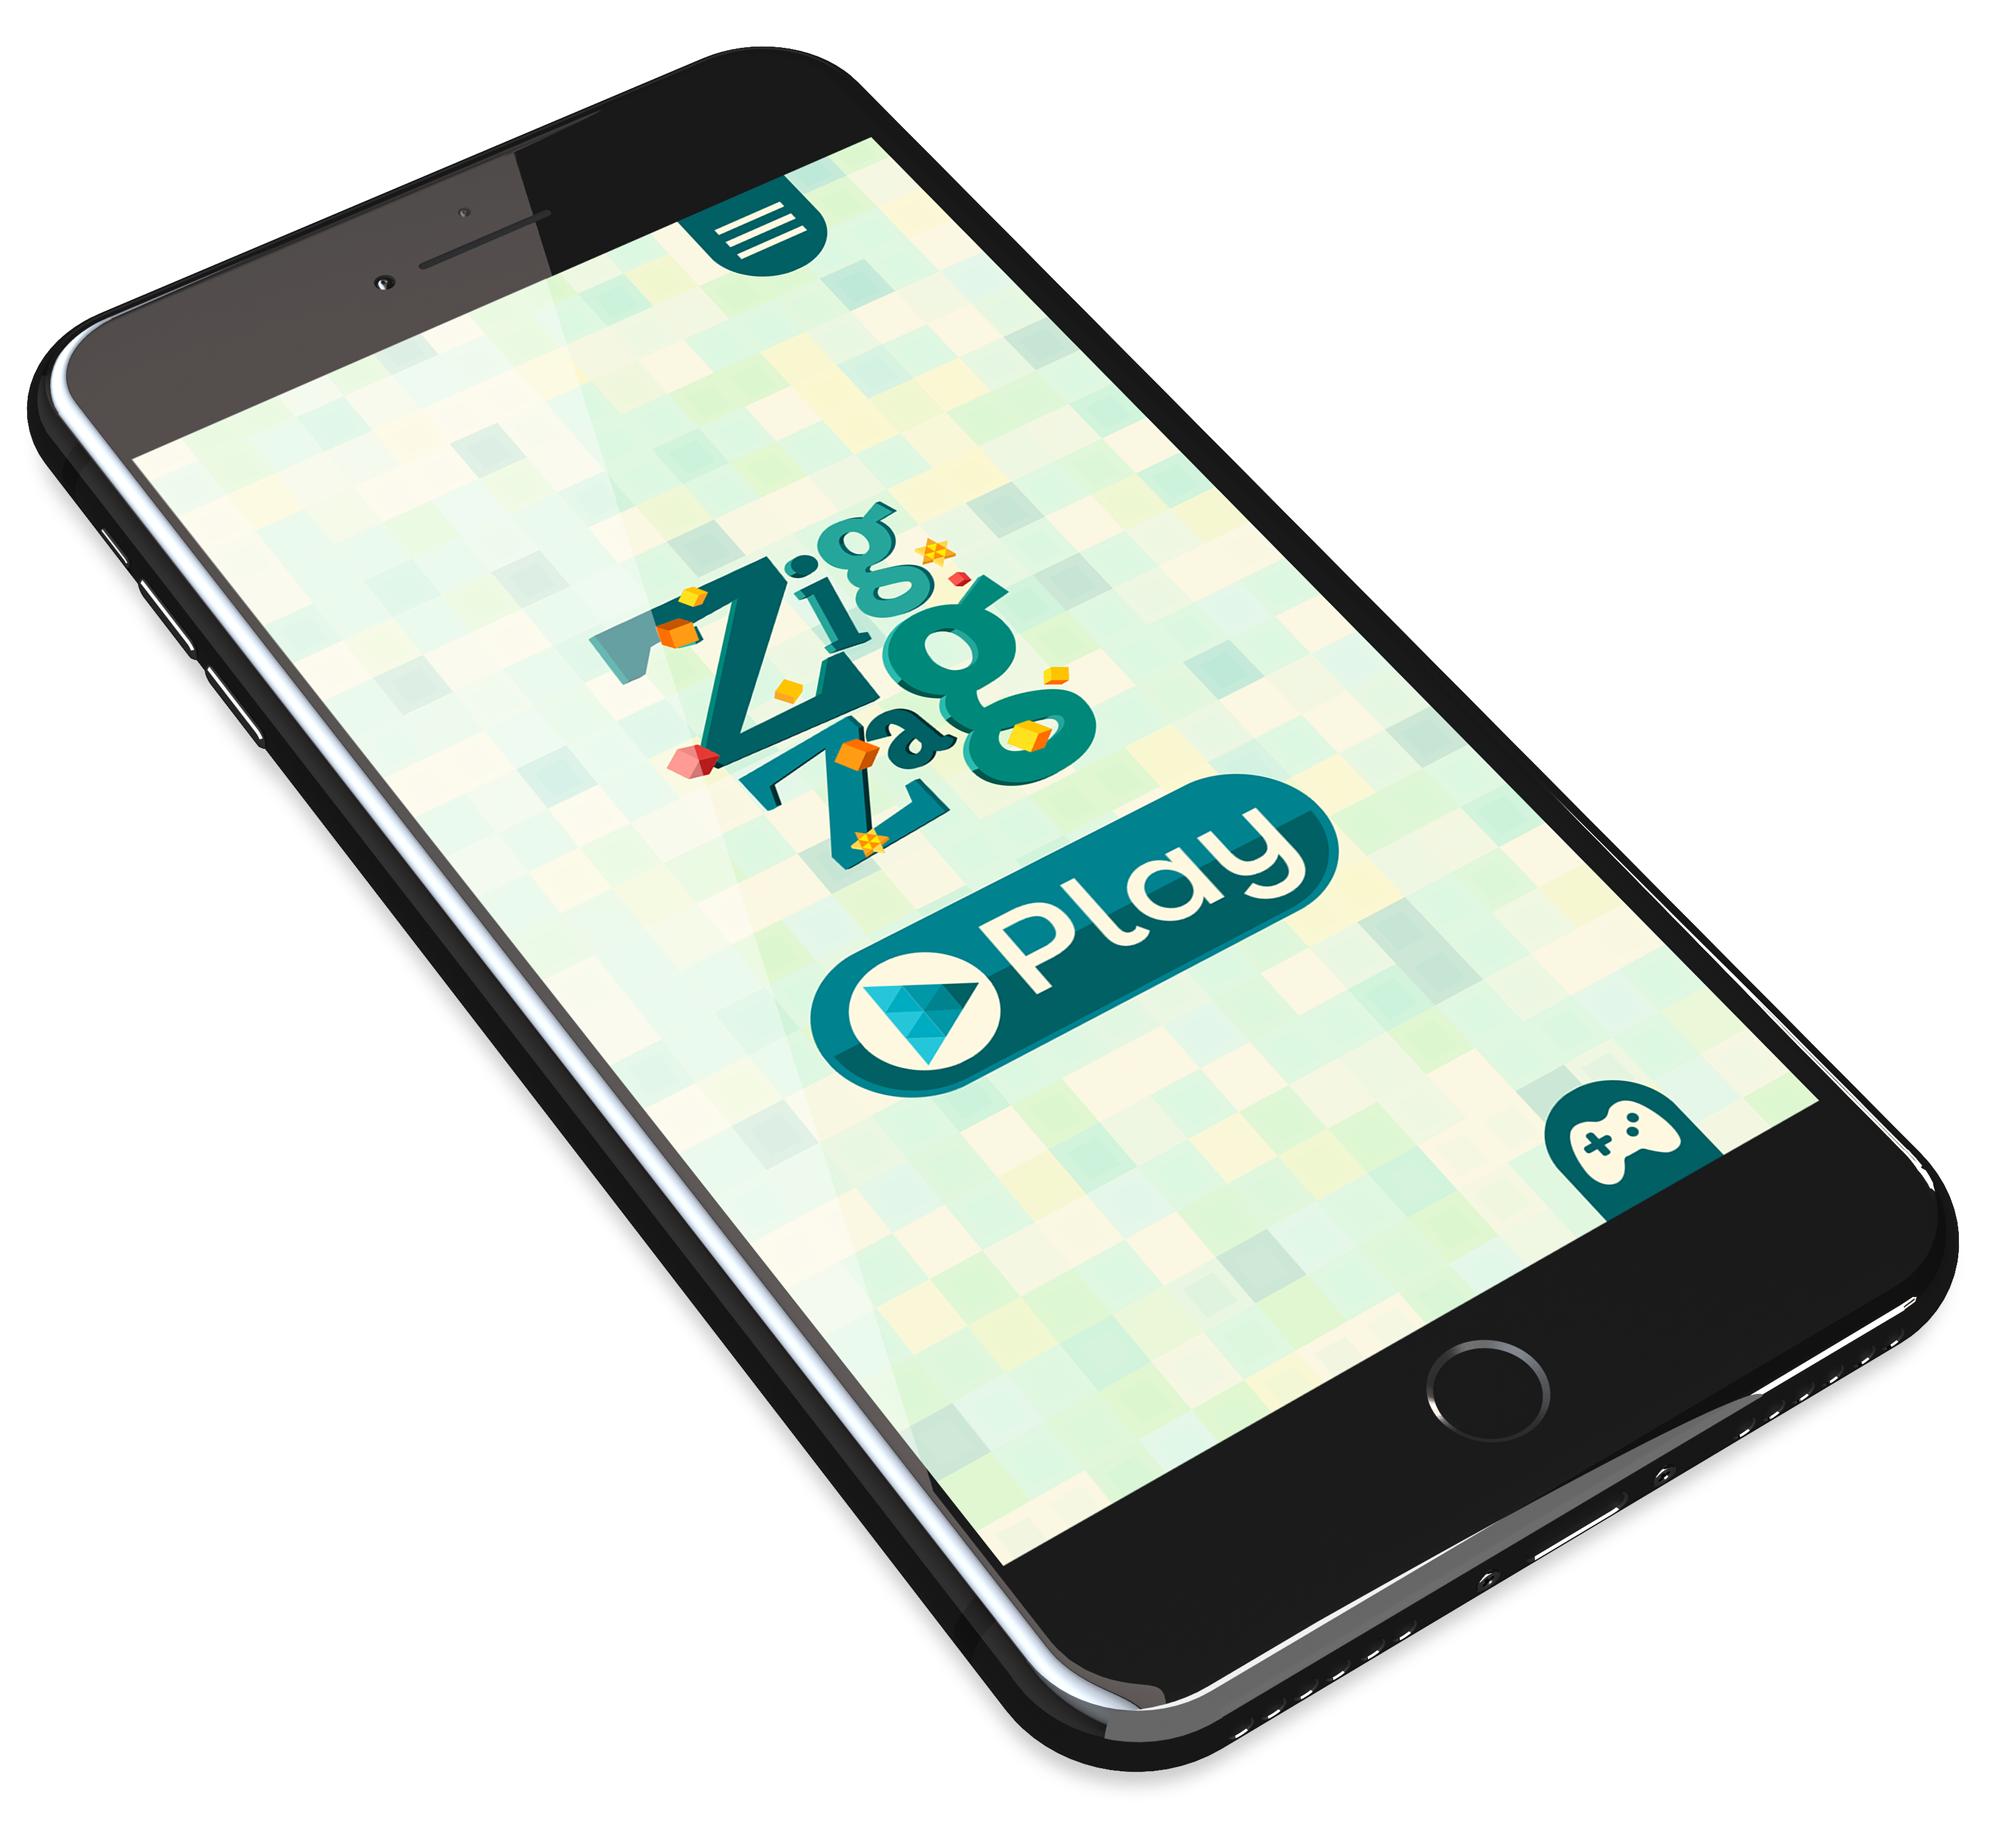 ZIG ZAG Mobile Device Home Screen